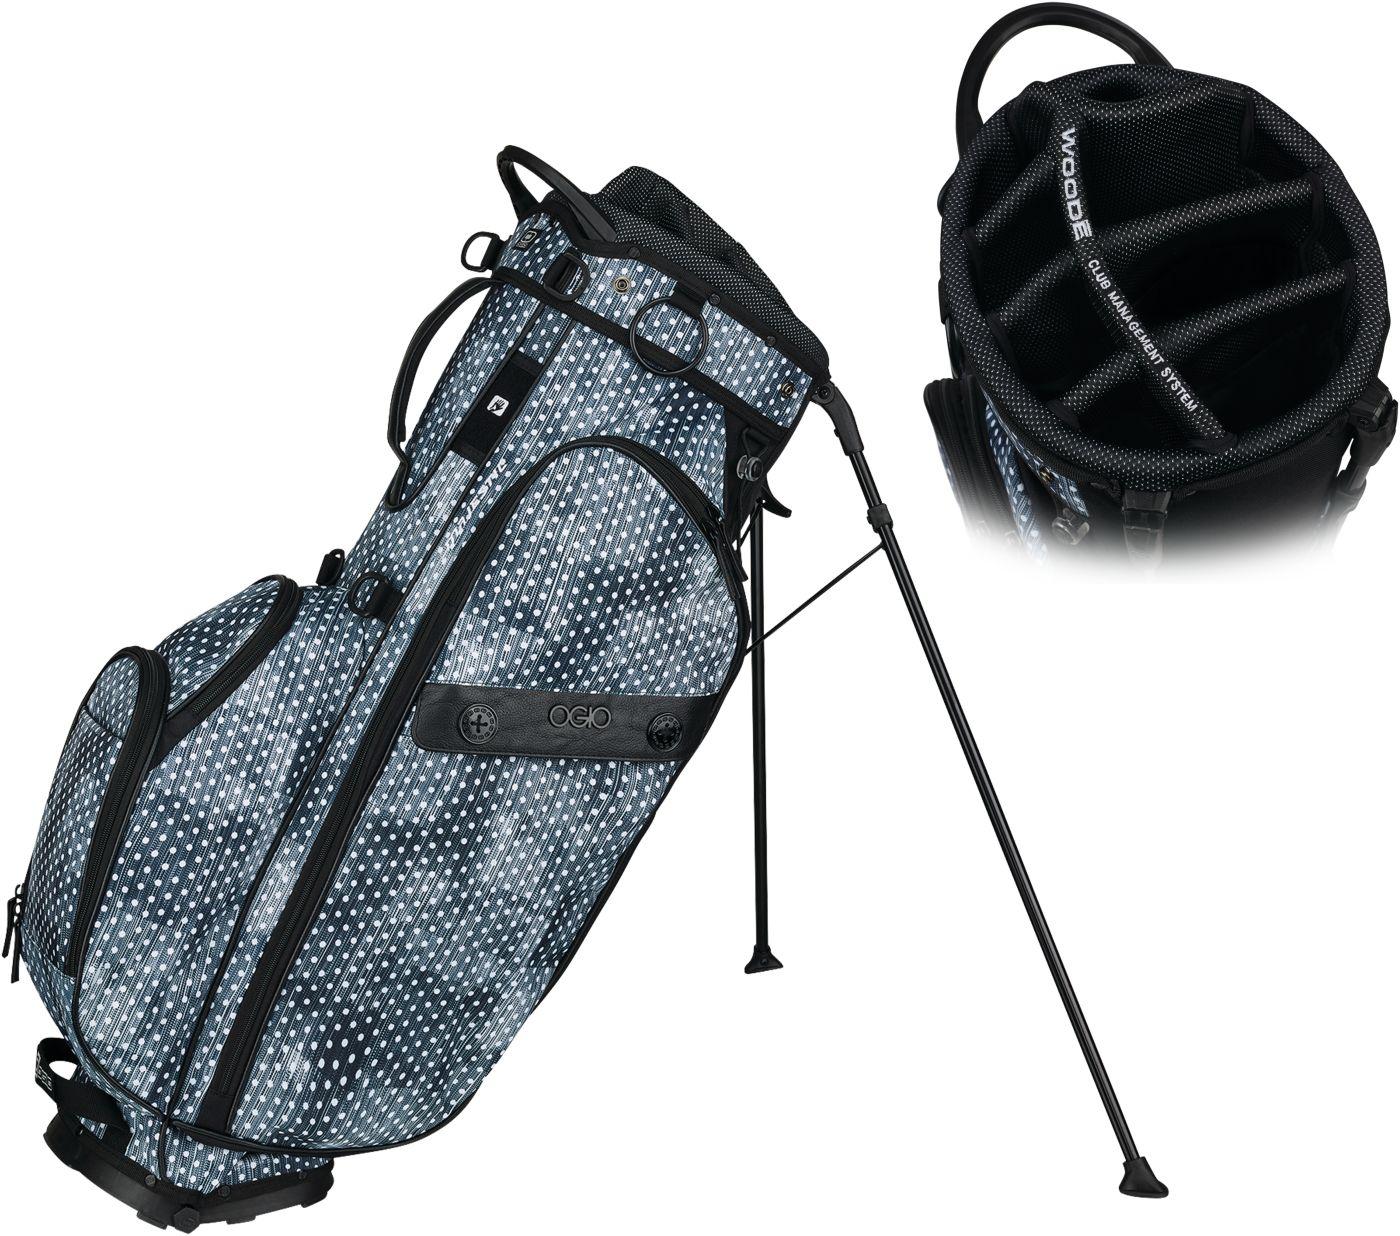 OGIO Women's 2018 Majestic Stand Golf Bag